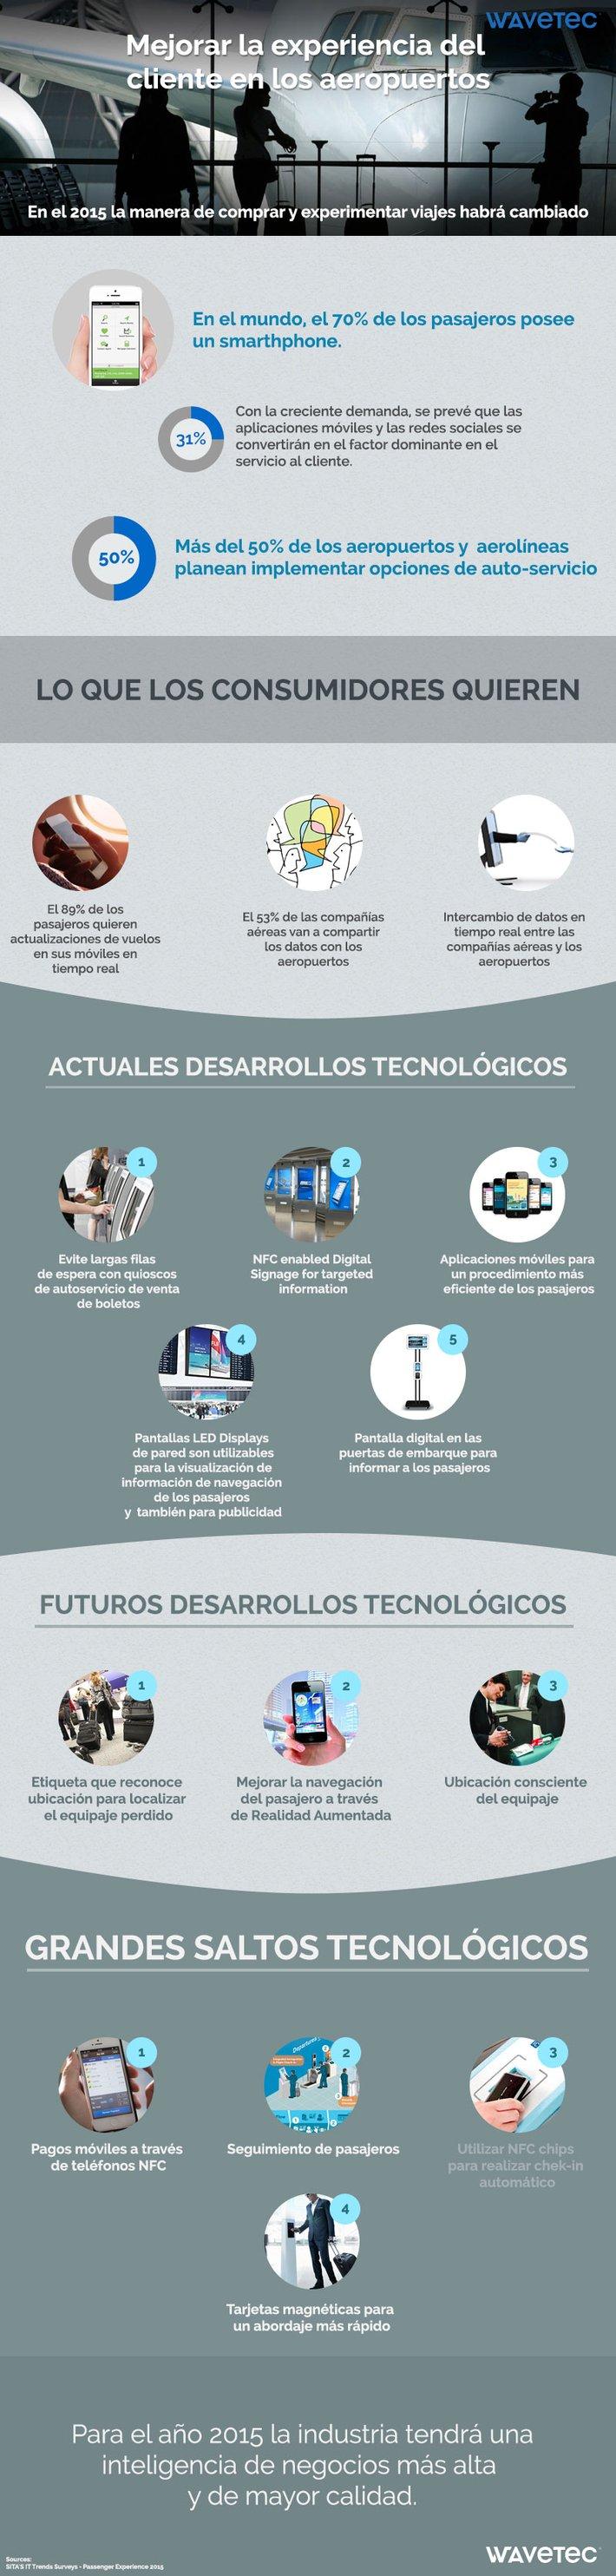 infographic-es.jpg